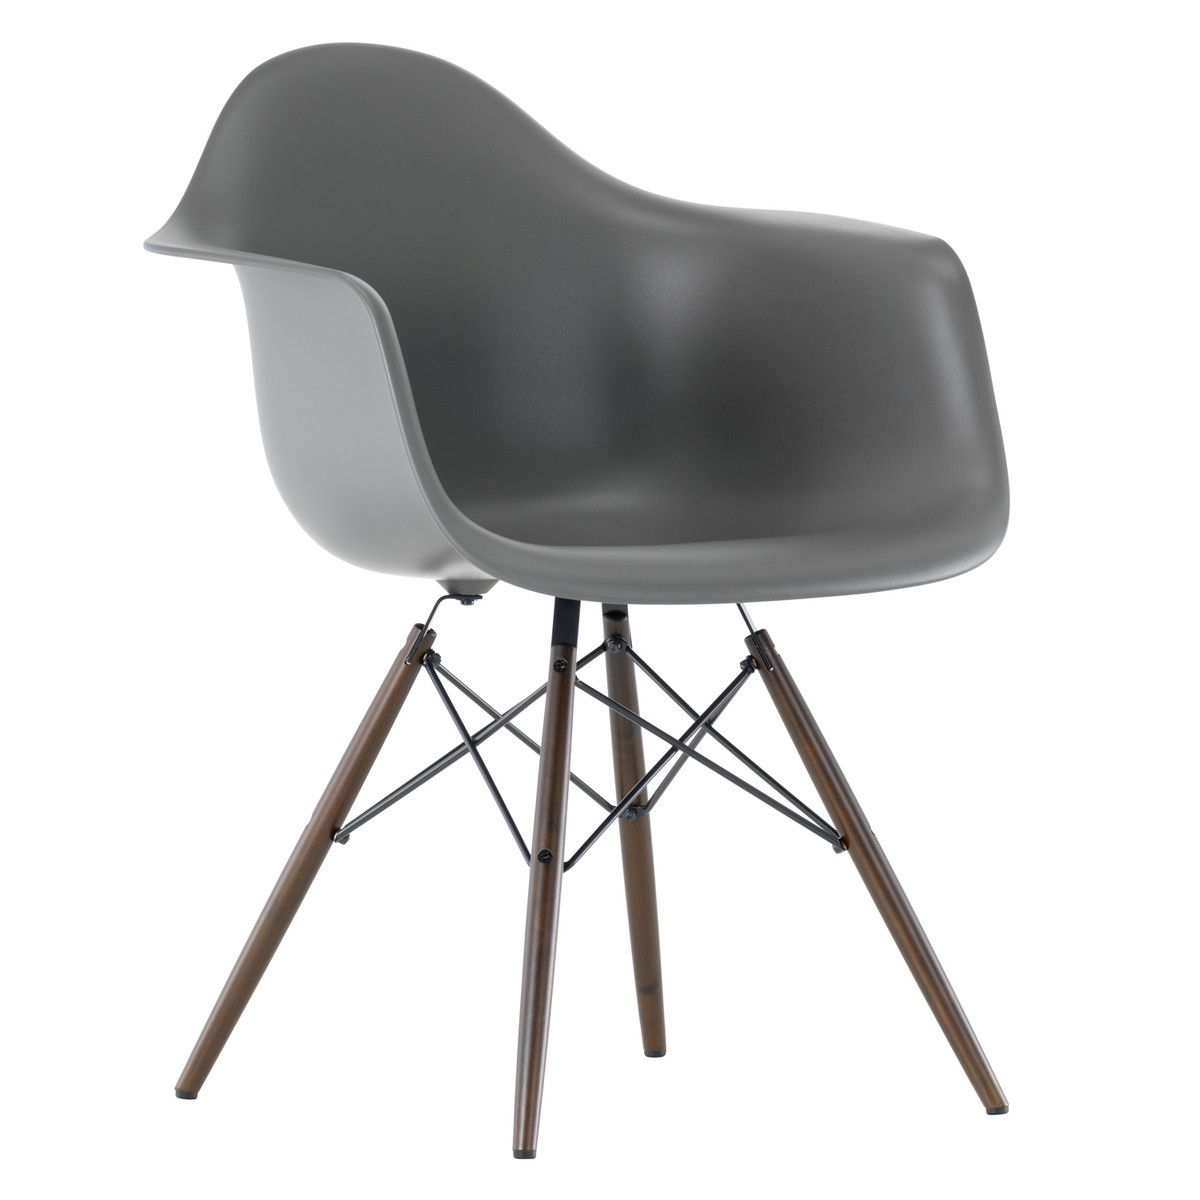 eames stuhl kaufen beautiful mbel einzigartig eames stuhl nachbau schn gakdo gakdo barhocker. Black Bedroom Furniture Sets. Home Design Ideas